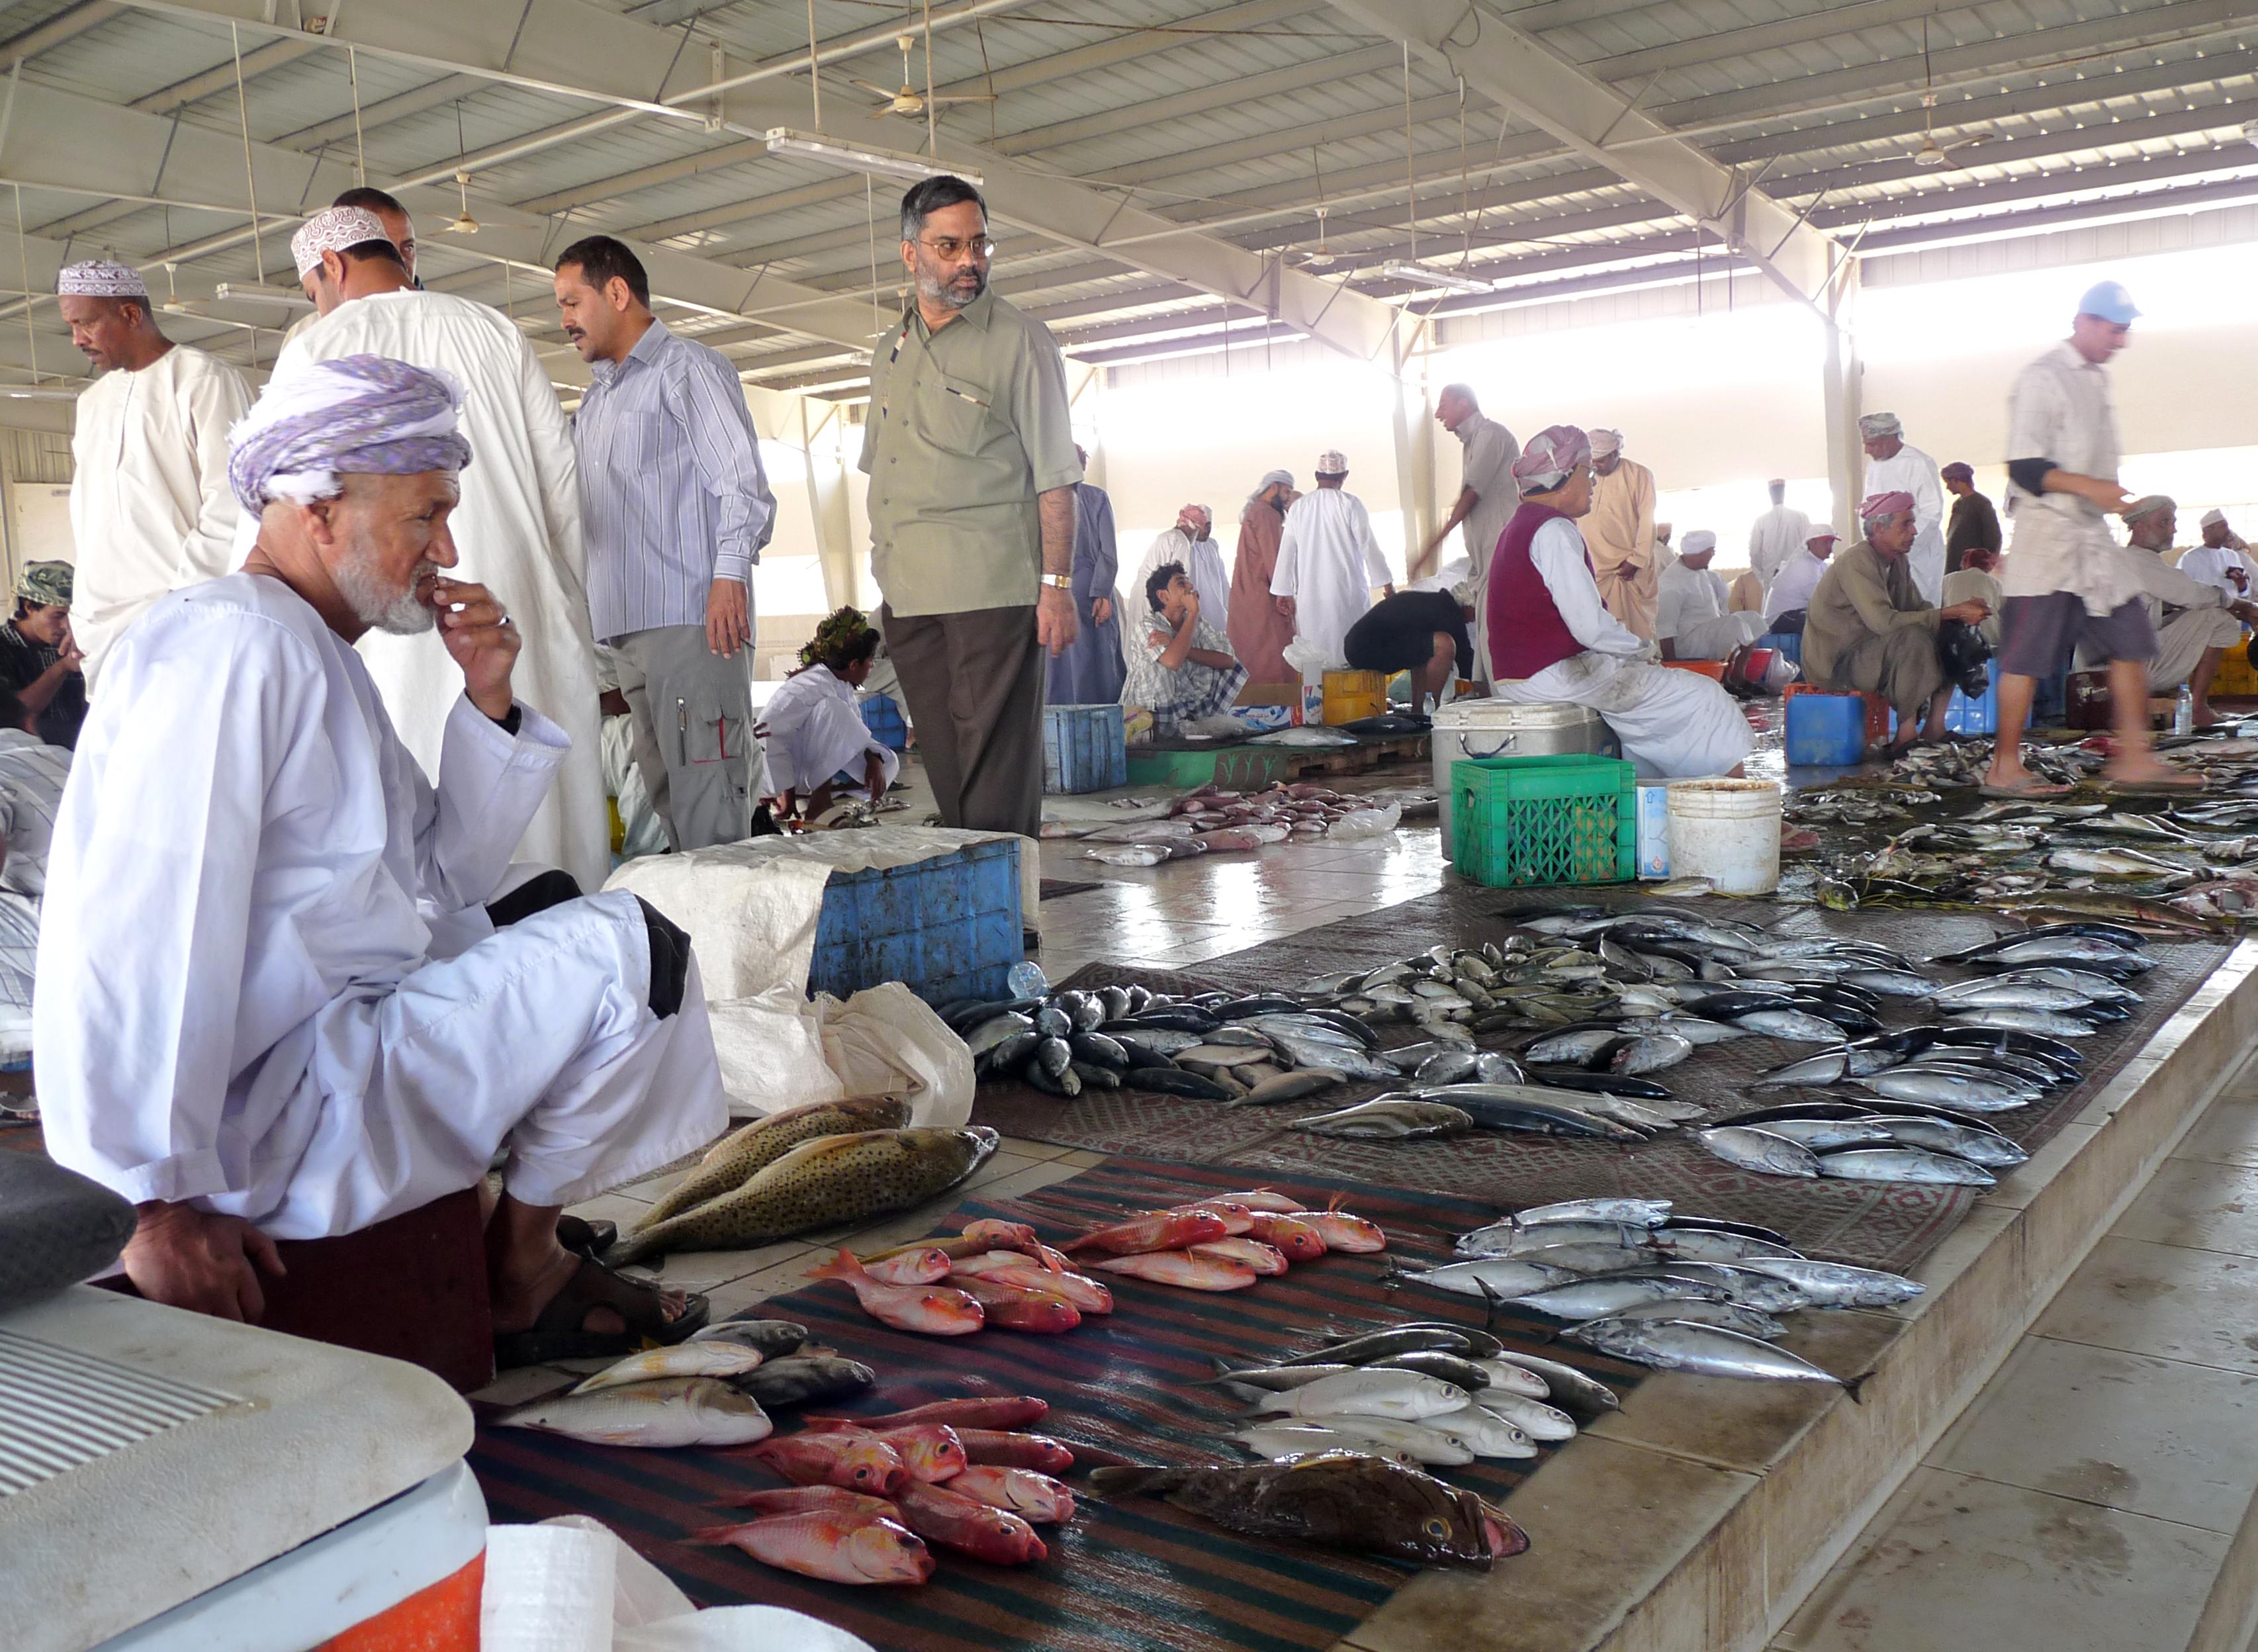 96a110c9bbce8 اقتصاد عمان - ويكيبيديا، الموسوعة الحرة